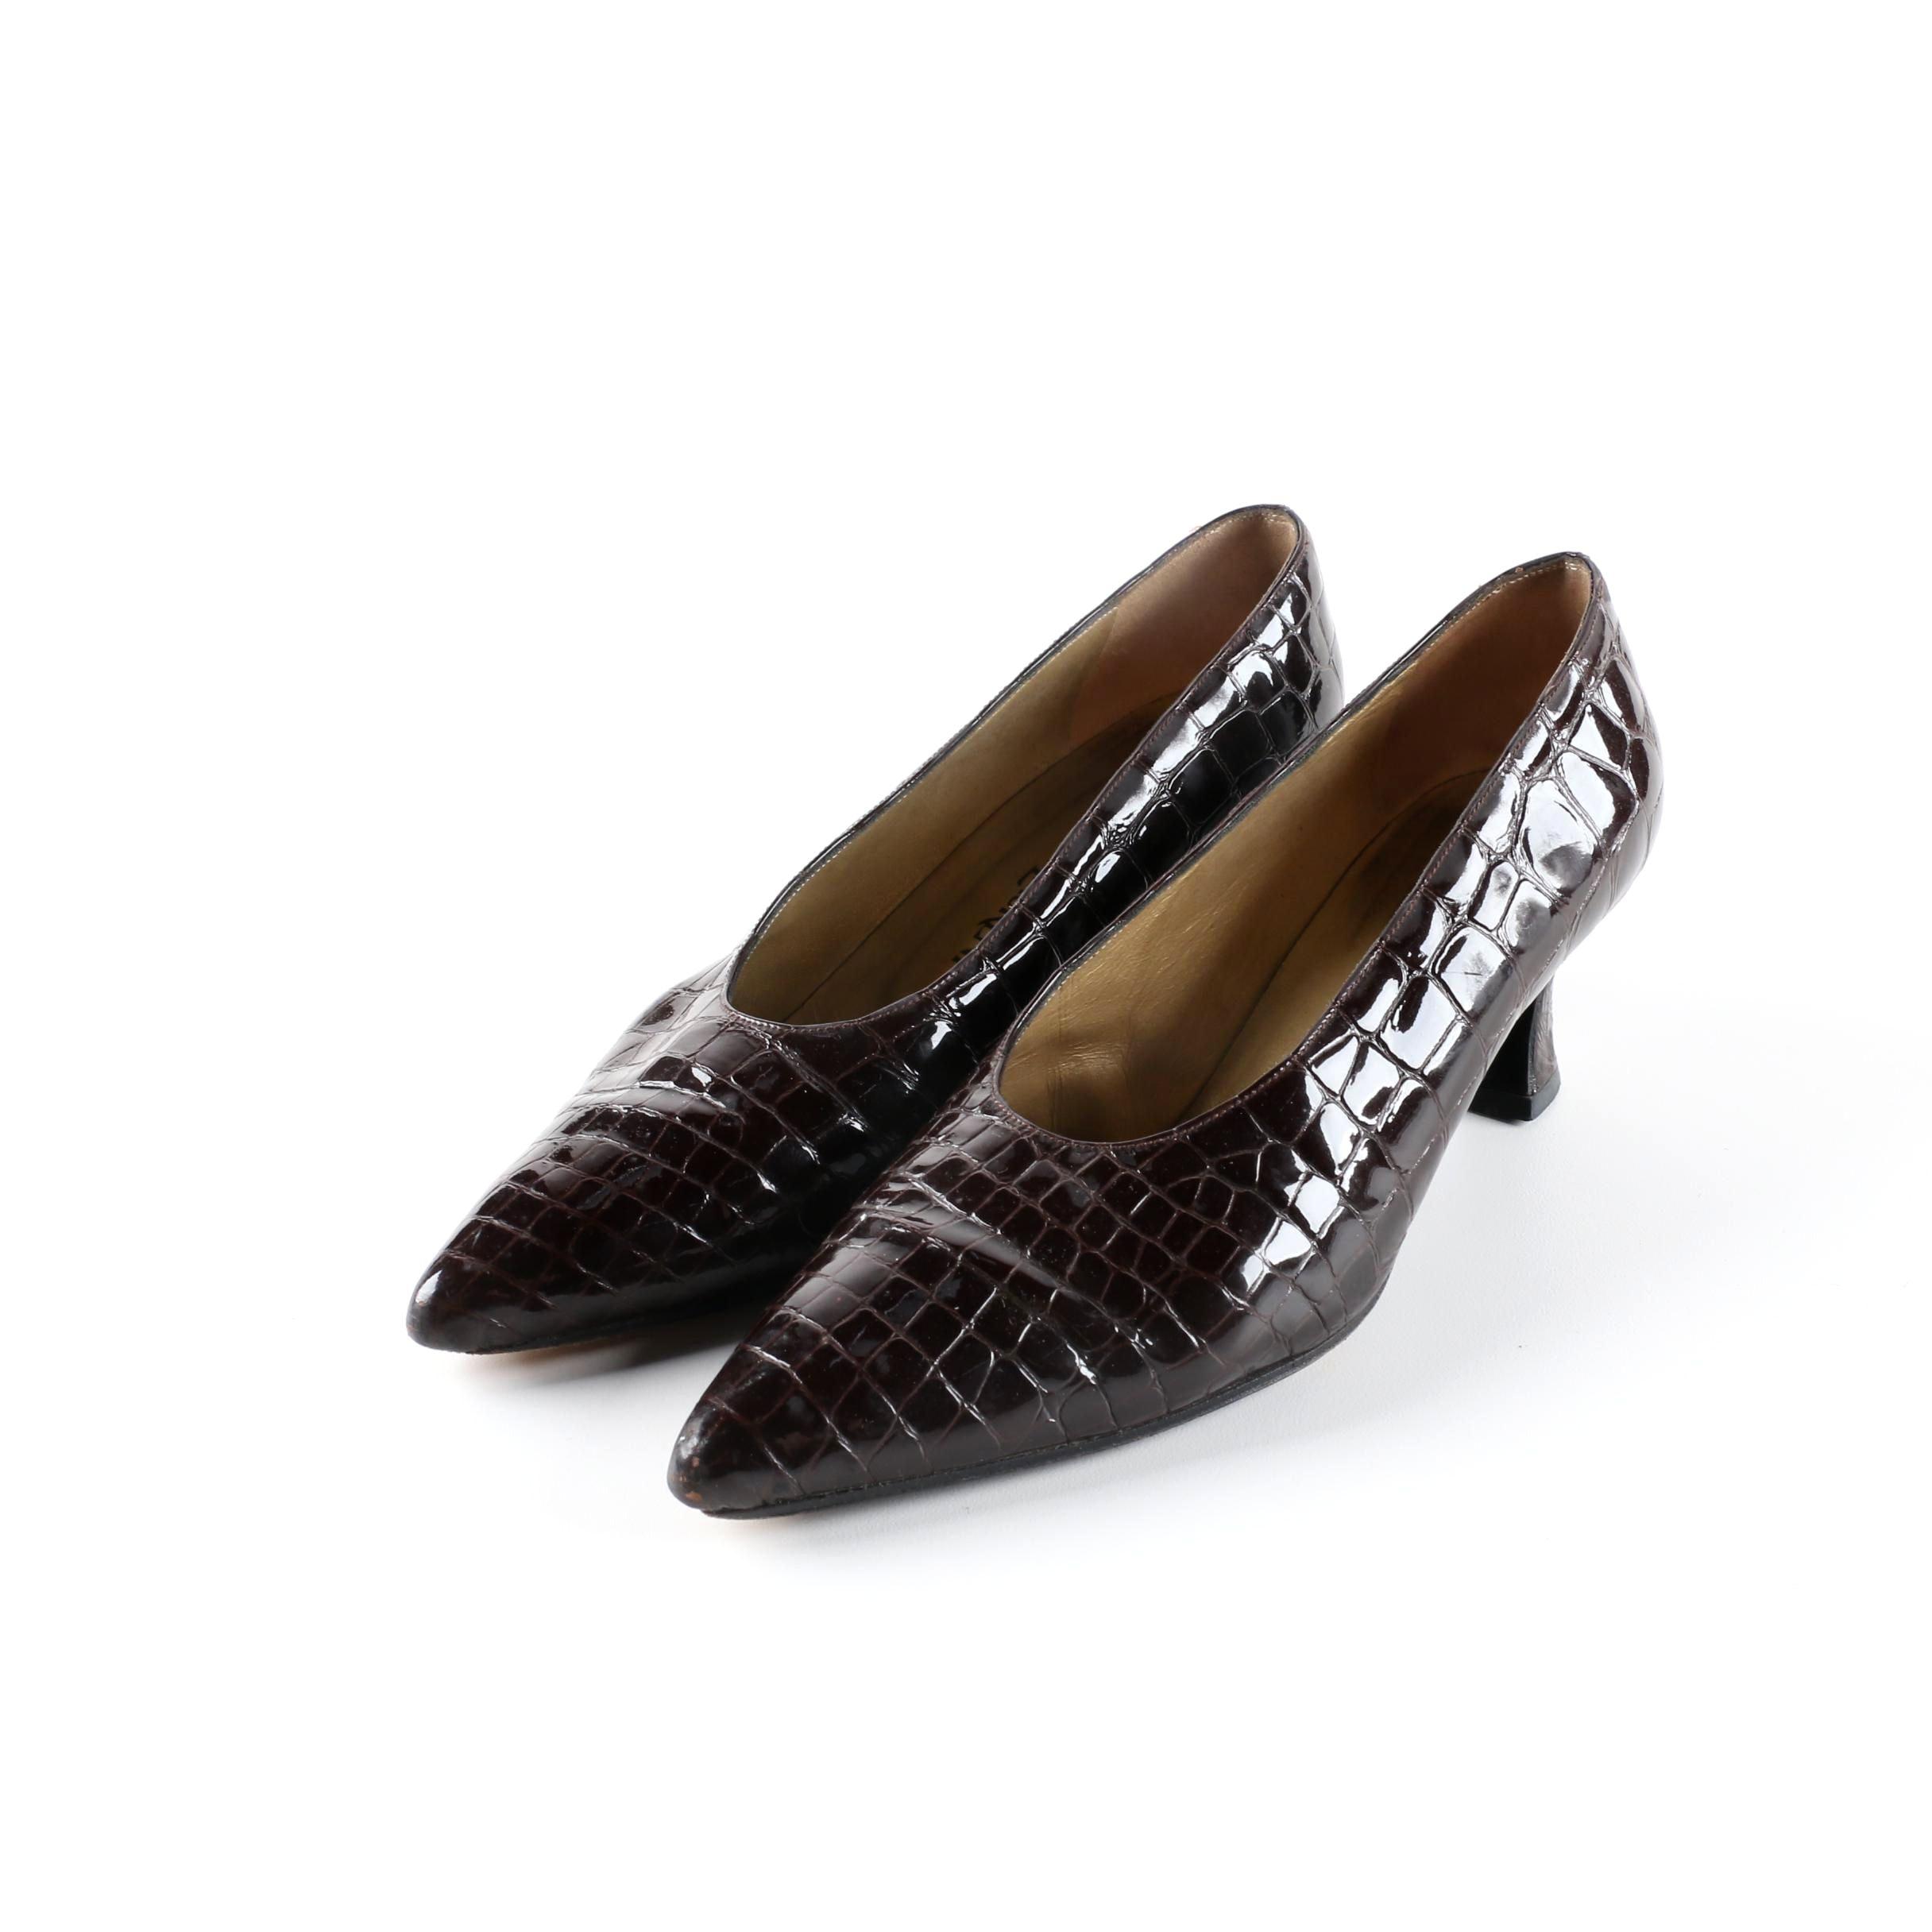 Vintage Yves Saint Laurent Brown Alligator Embossed Patent Leather Pumps